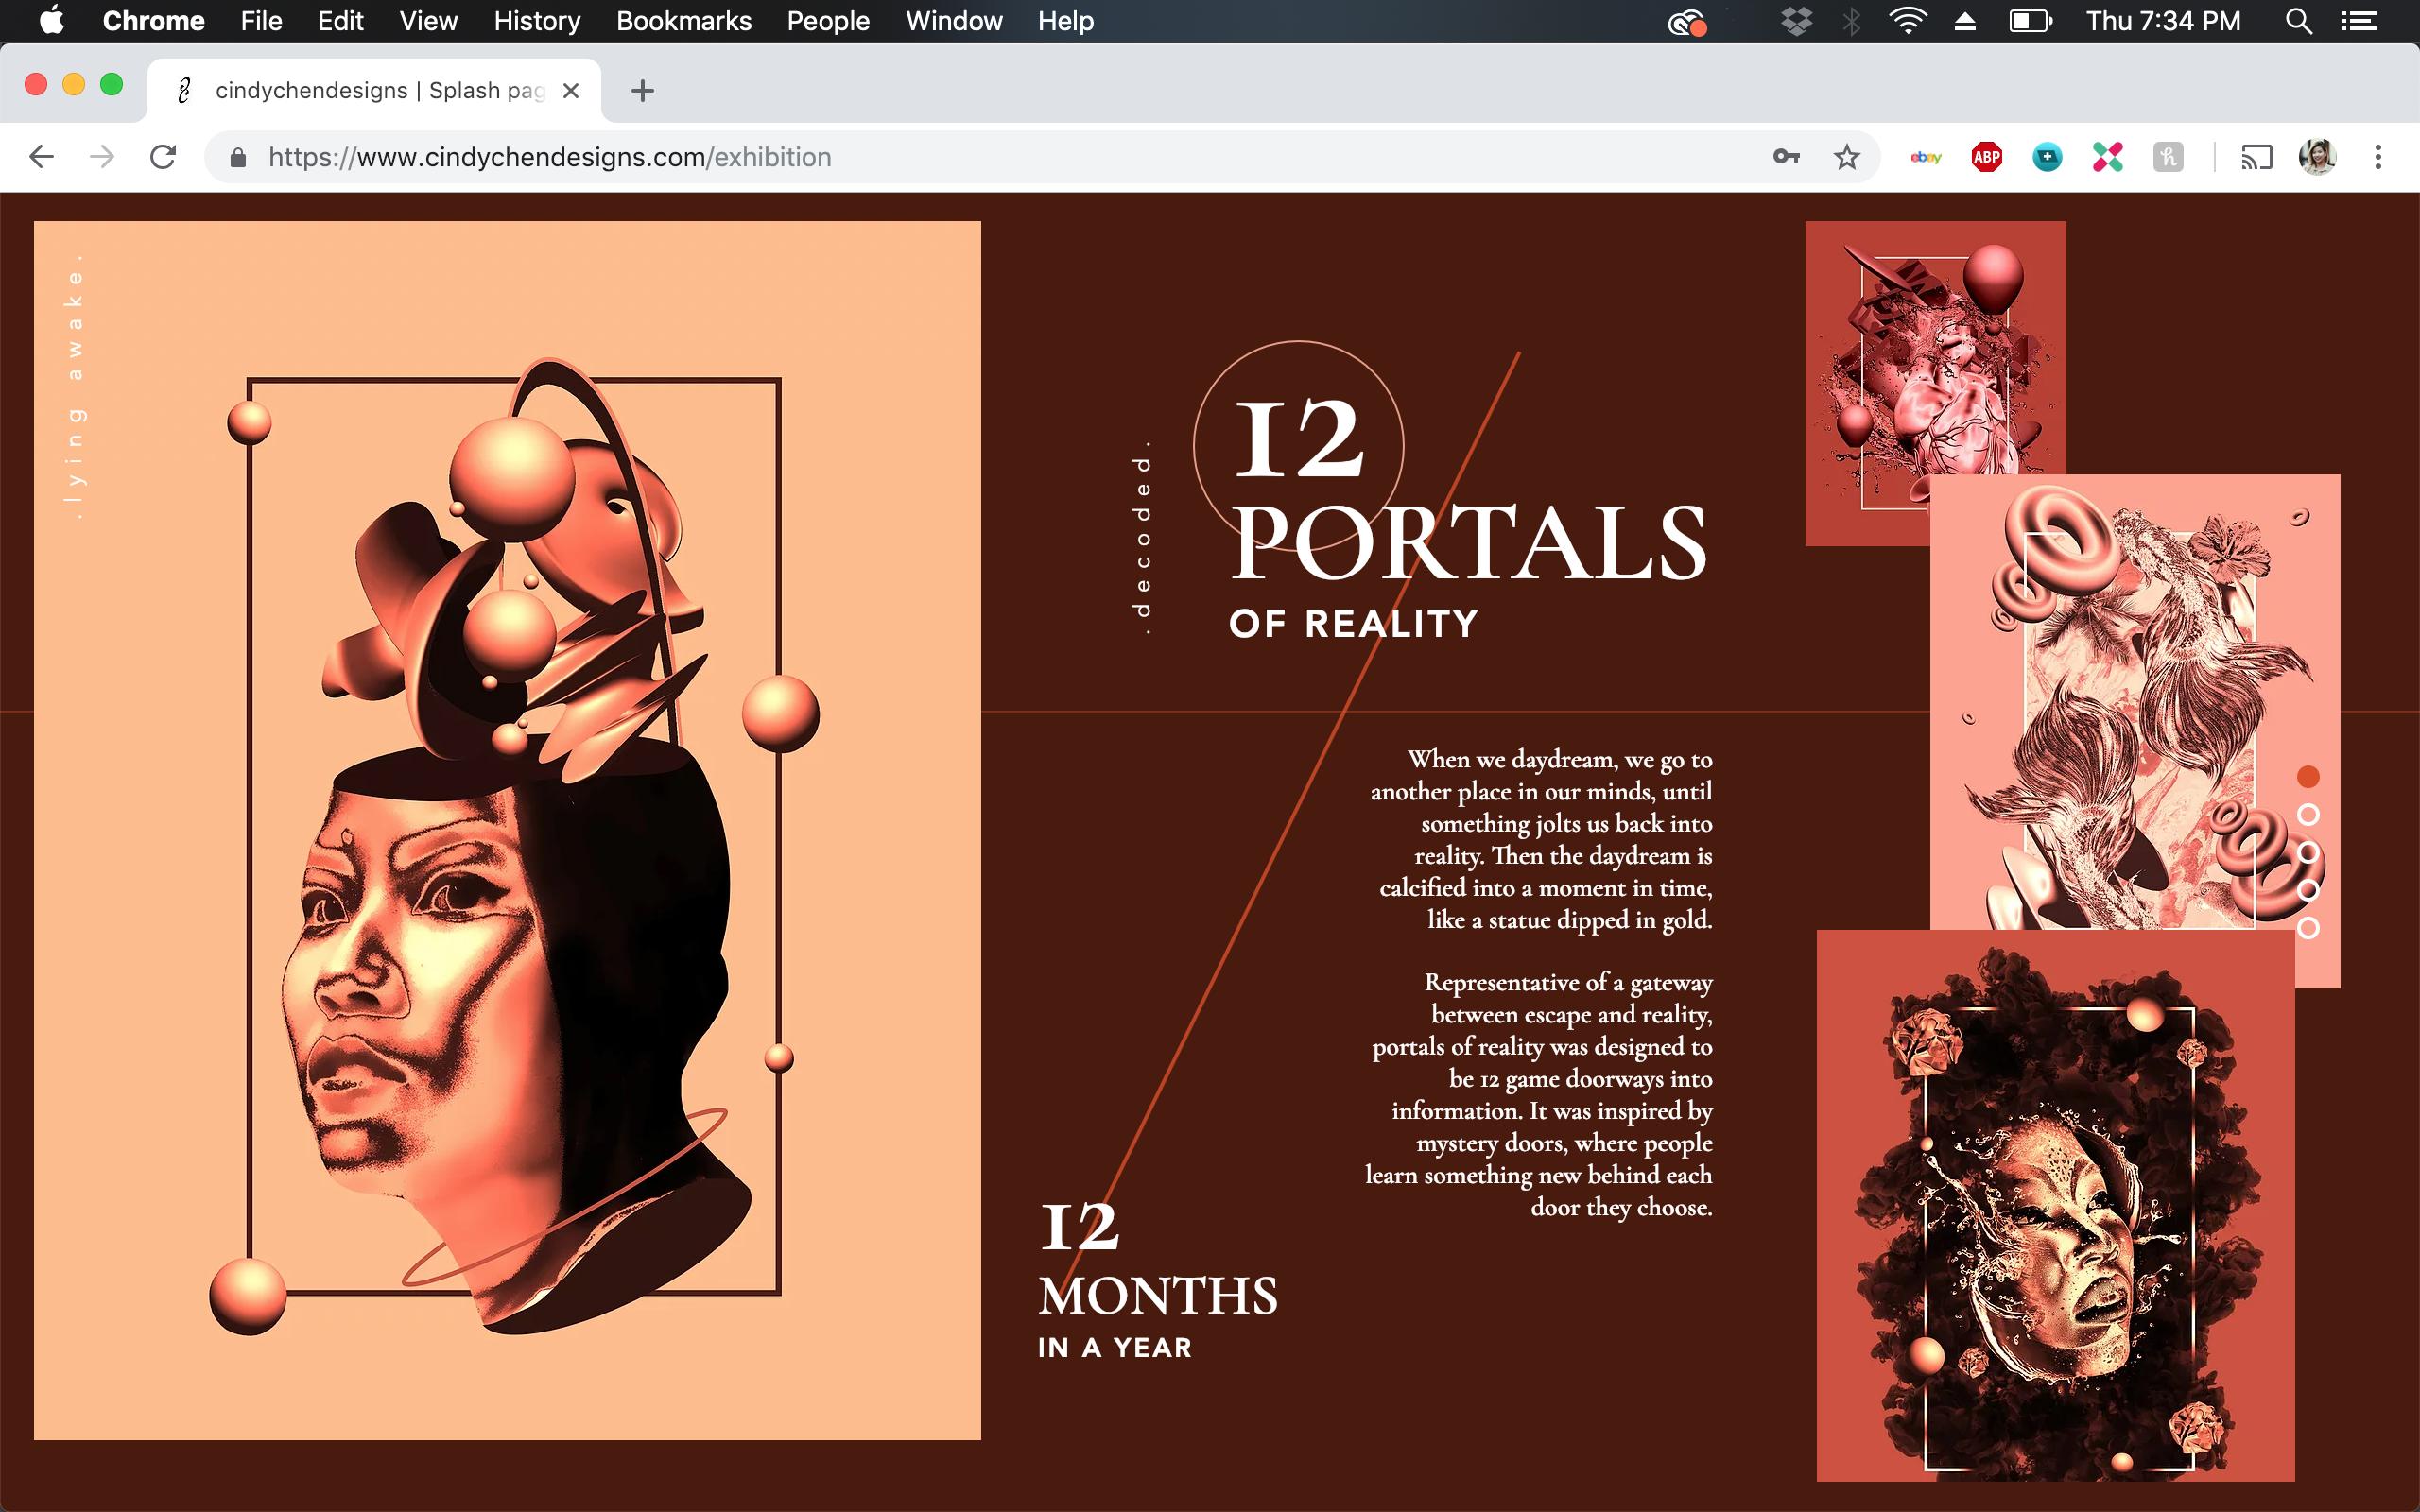 Exhibition Page P1